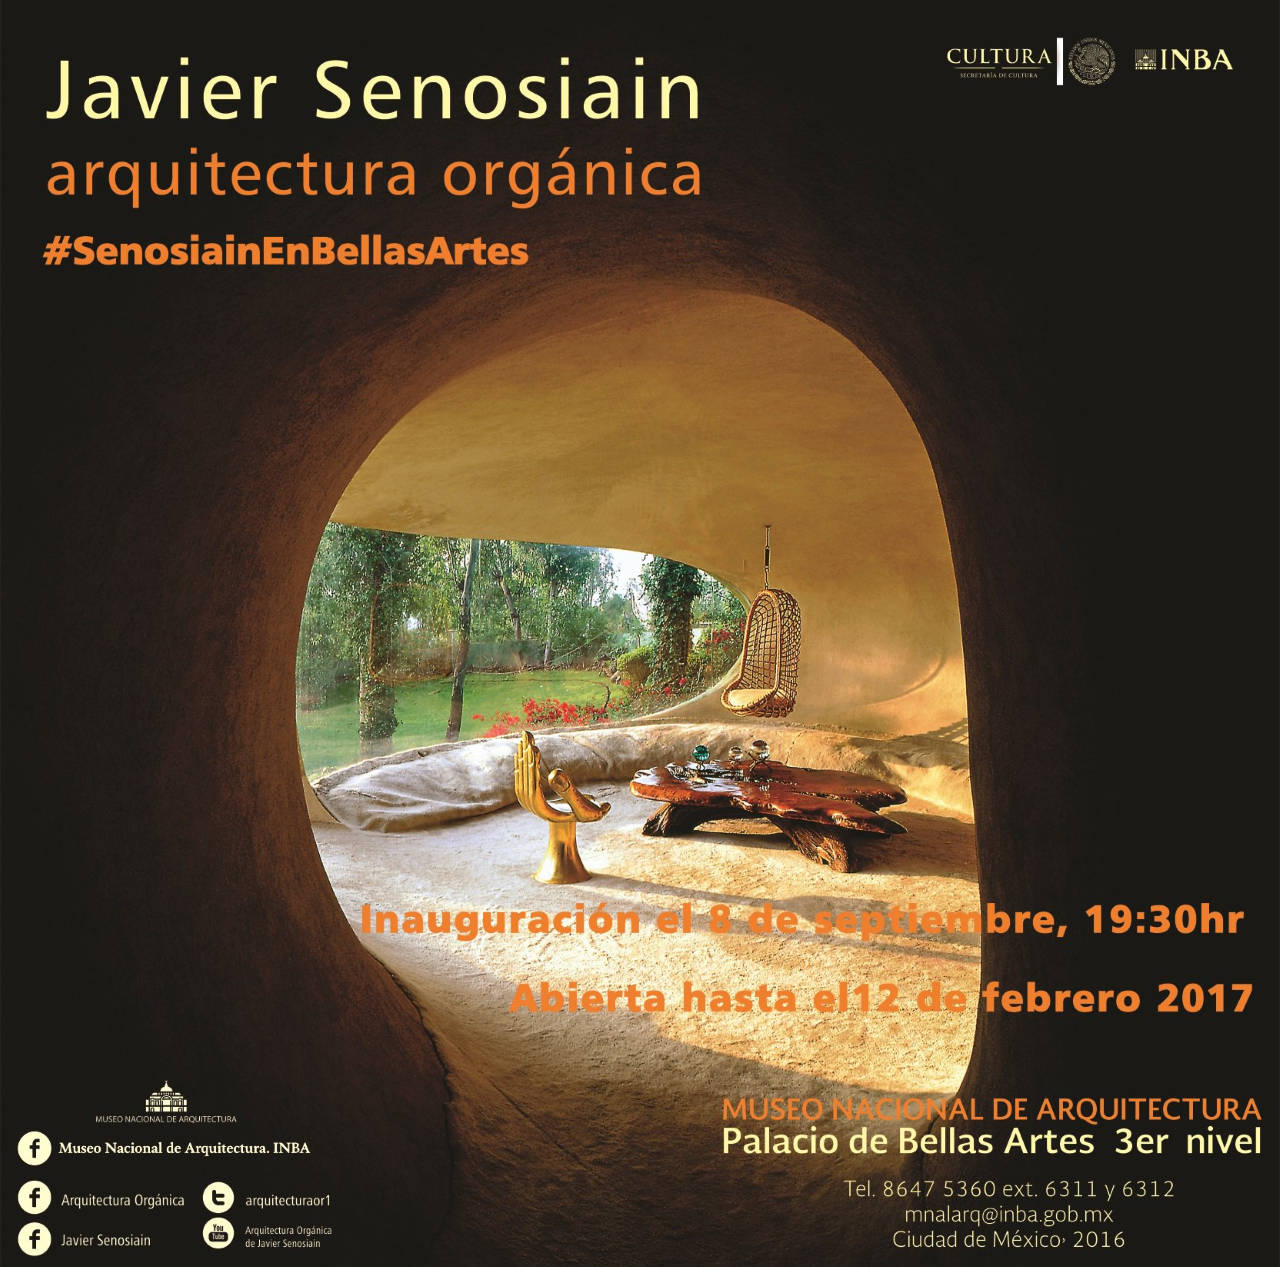 La Arquitectura Orgánica de Senosiain : Poster © Arquitecto Javier Senosiain, cortesía del © INBA